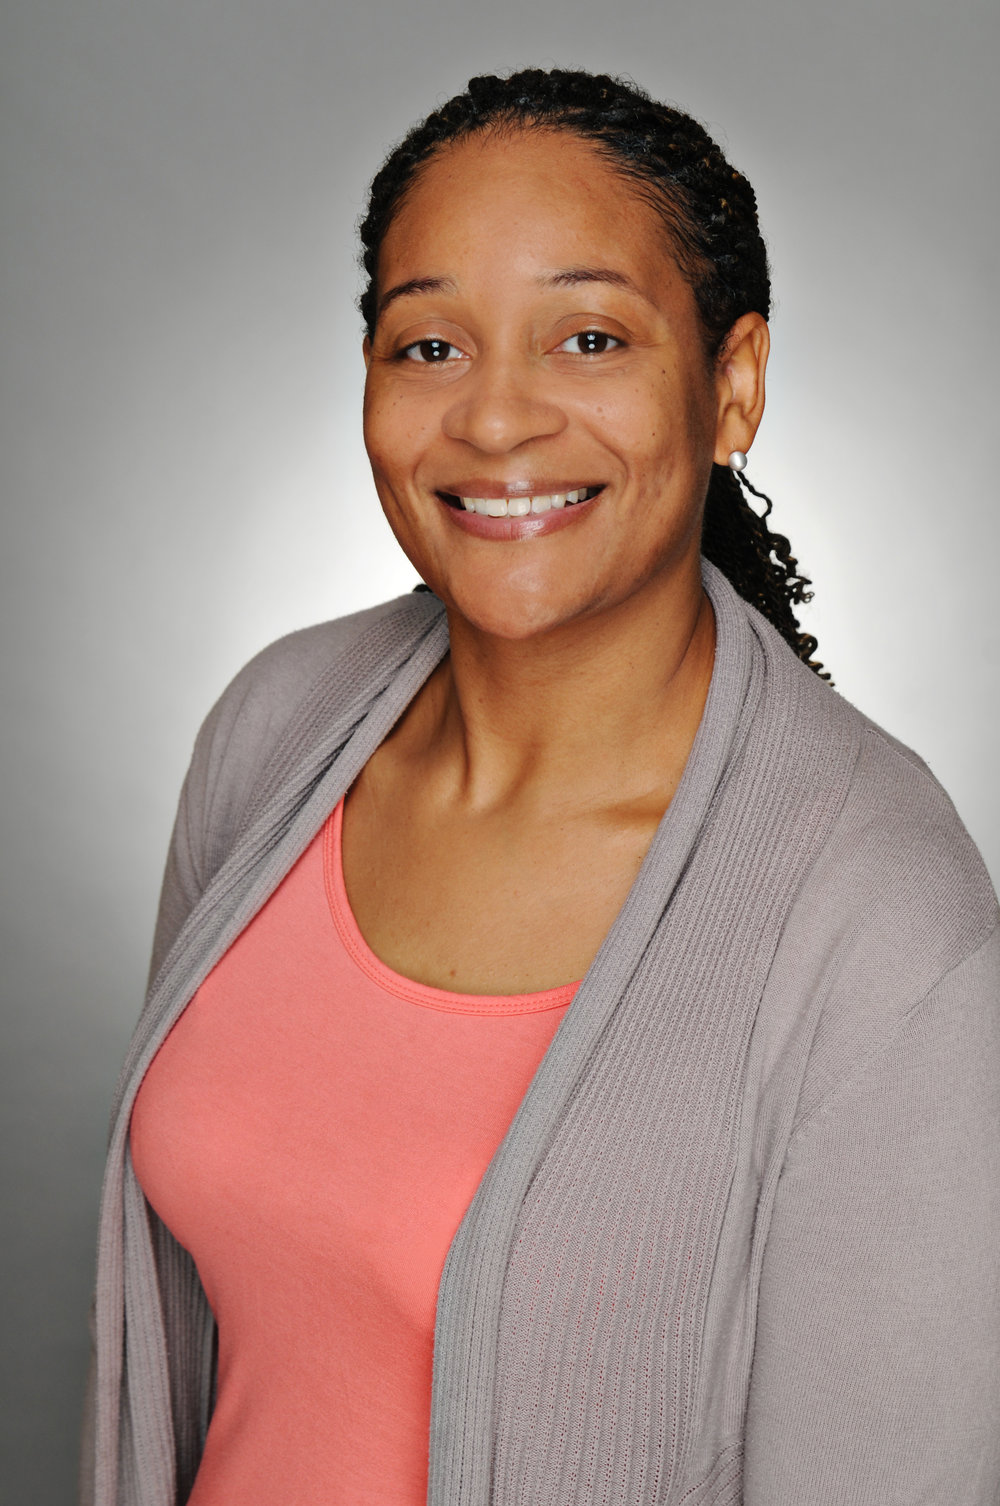 LaShika Taylor, BSHA/HM, RMA, Outreach & Enrollment Coordinator